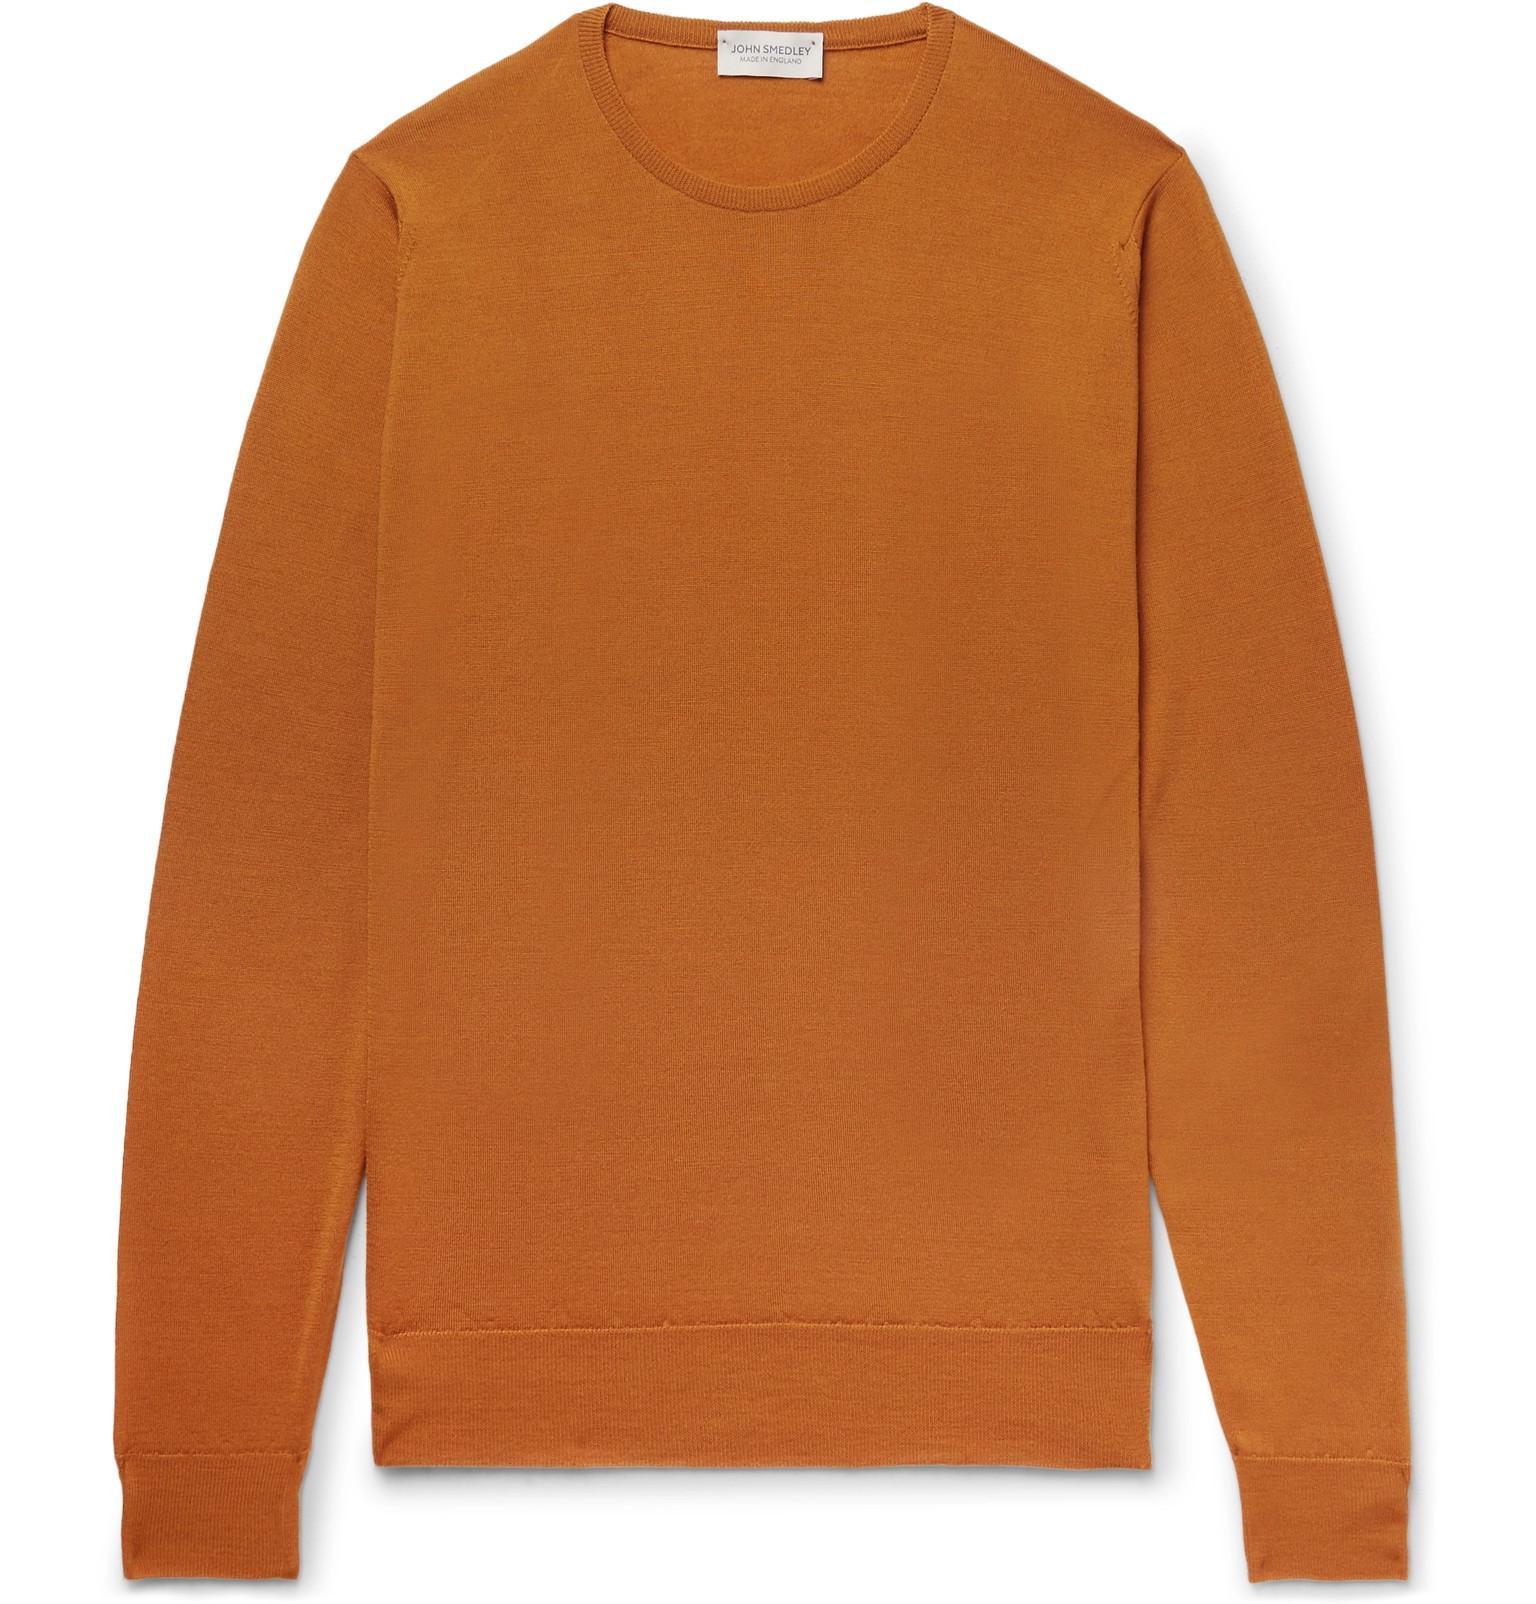 Lundy para Slim lana Lyst hombres Fit Smedley merino John naranja de suéter Zqz6Et